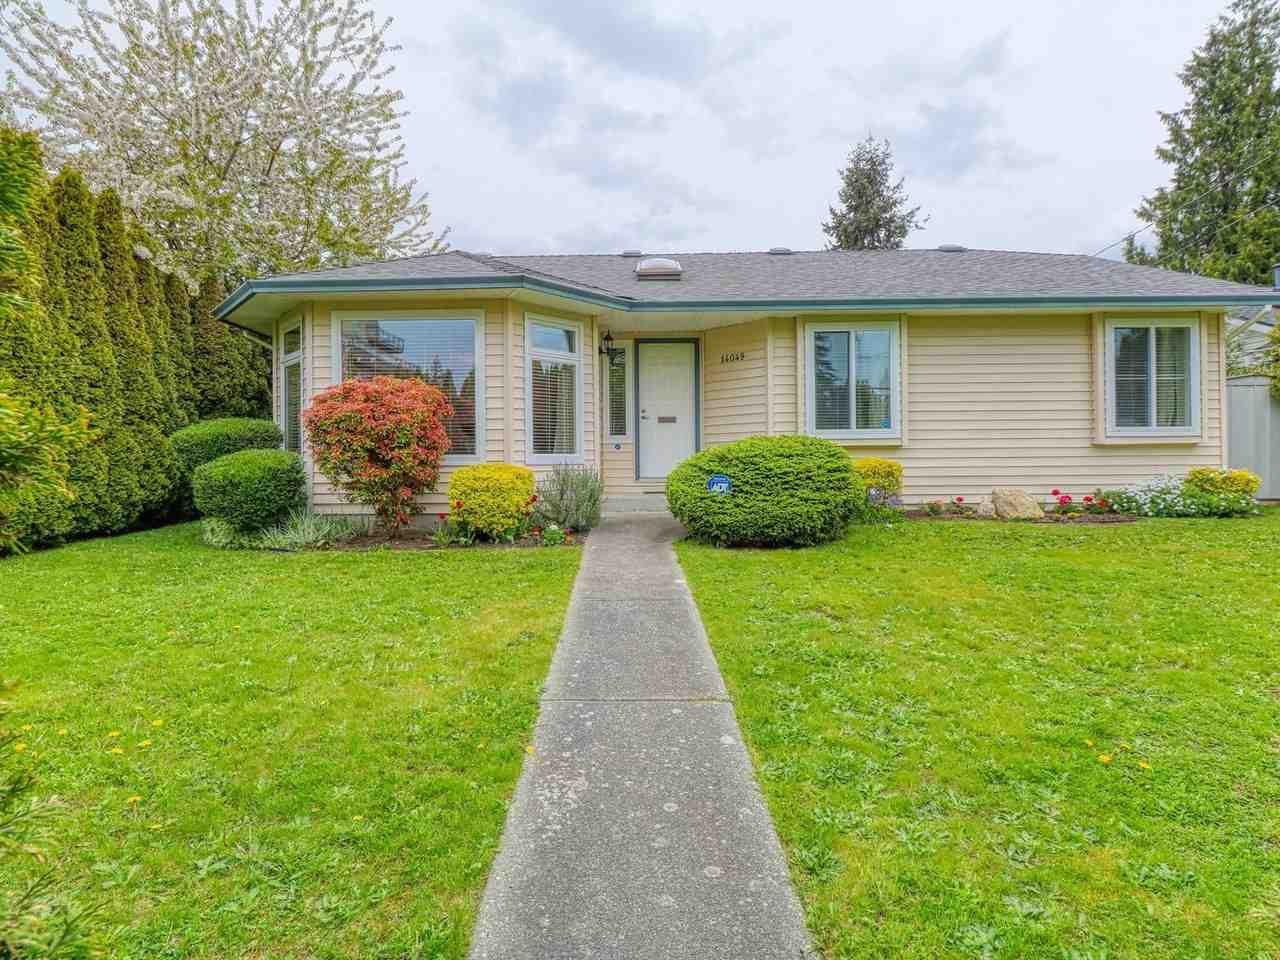 Main Photo: 14049 16 Avenue in Surrey: Sunnyside Park Surrey House for sale (South Surrey White Rock)  : MLS®# R2452952